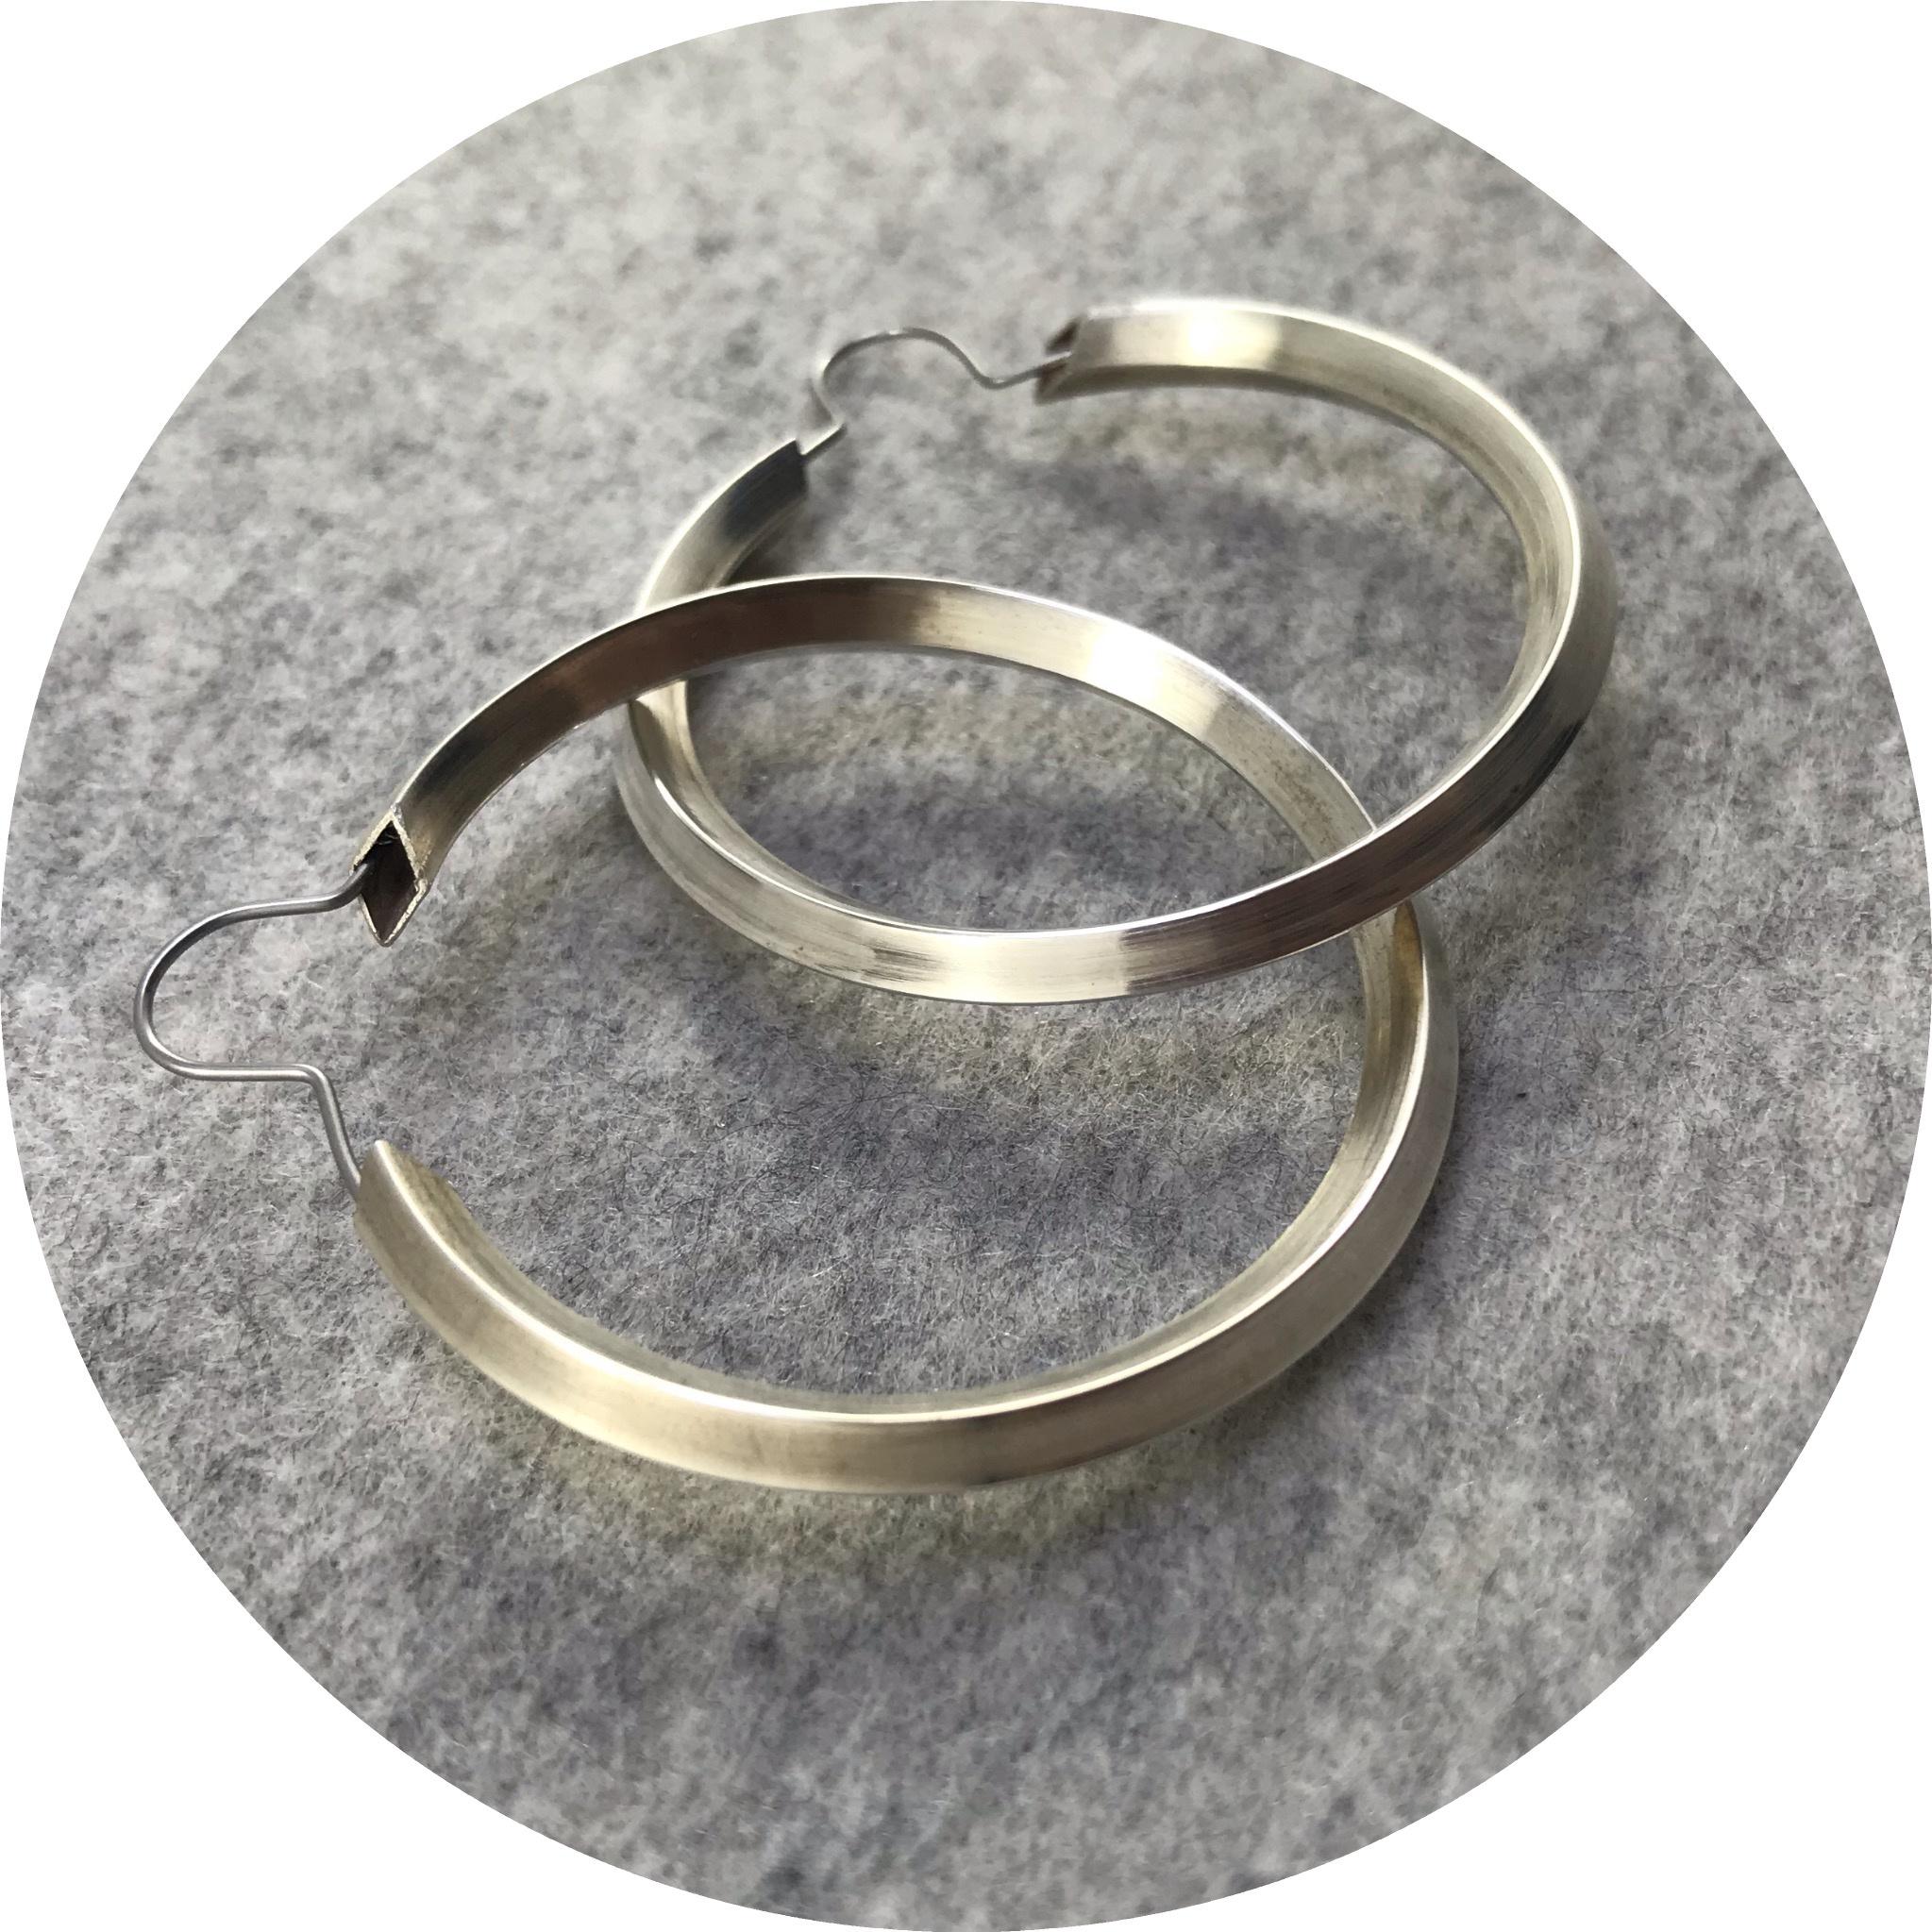 Kristina Neumann - 'Original Silver Hoops', 925 silver, stainless steel